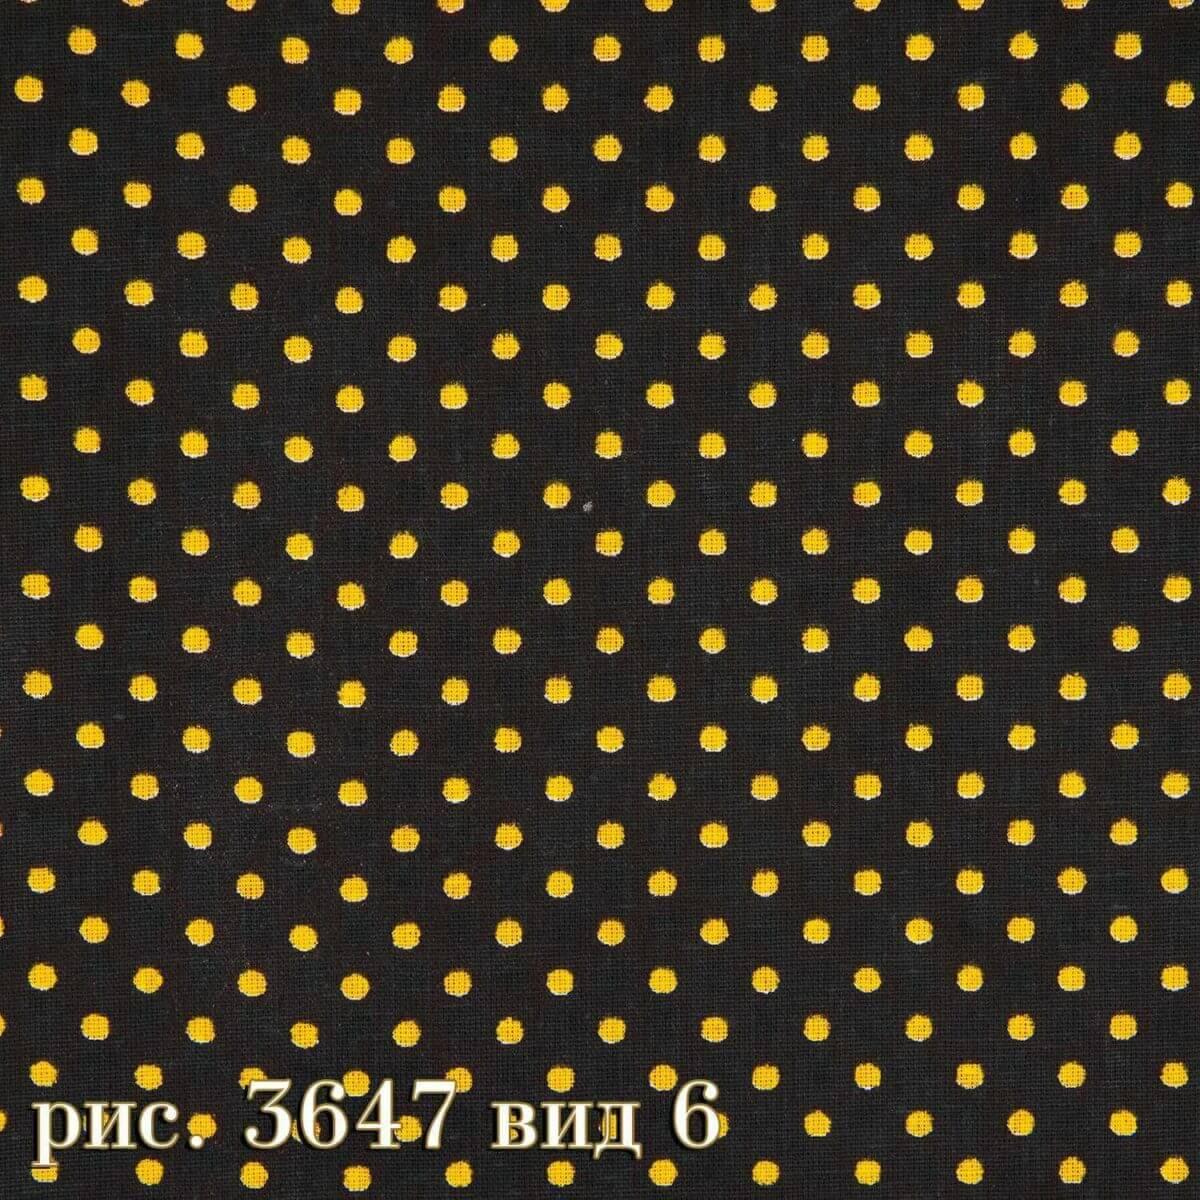 Фото 23 - Плательная ткань бязь 150 см (3647/9) Под заказ.